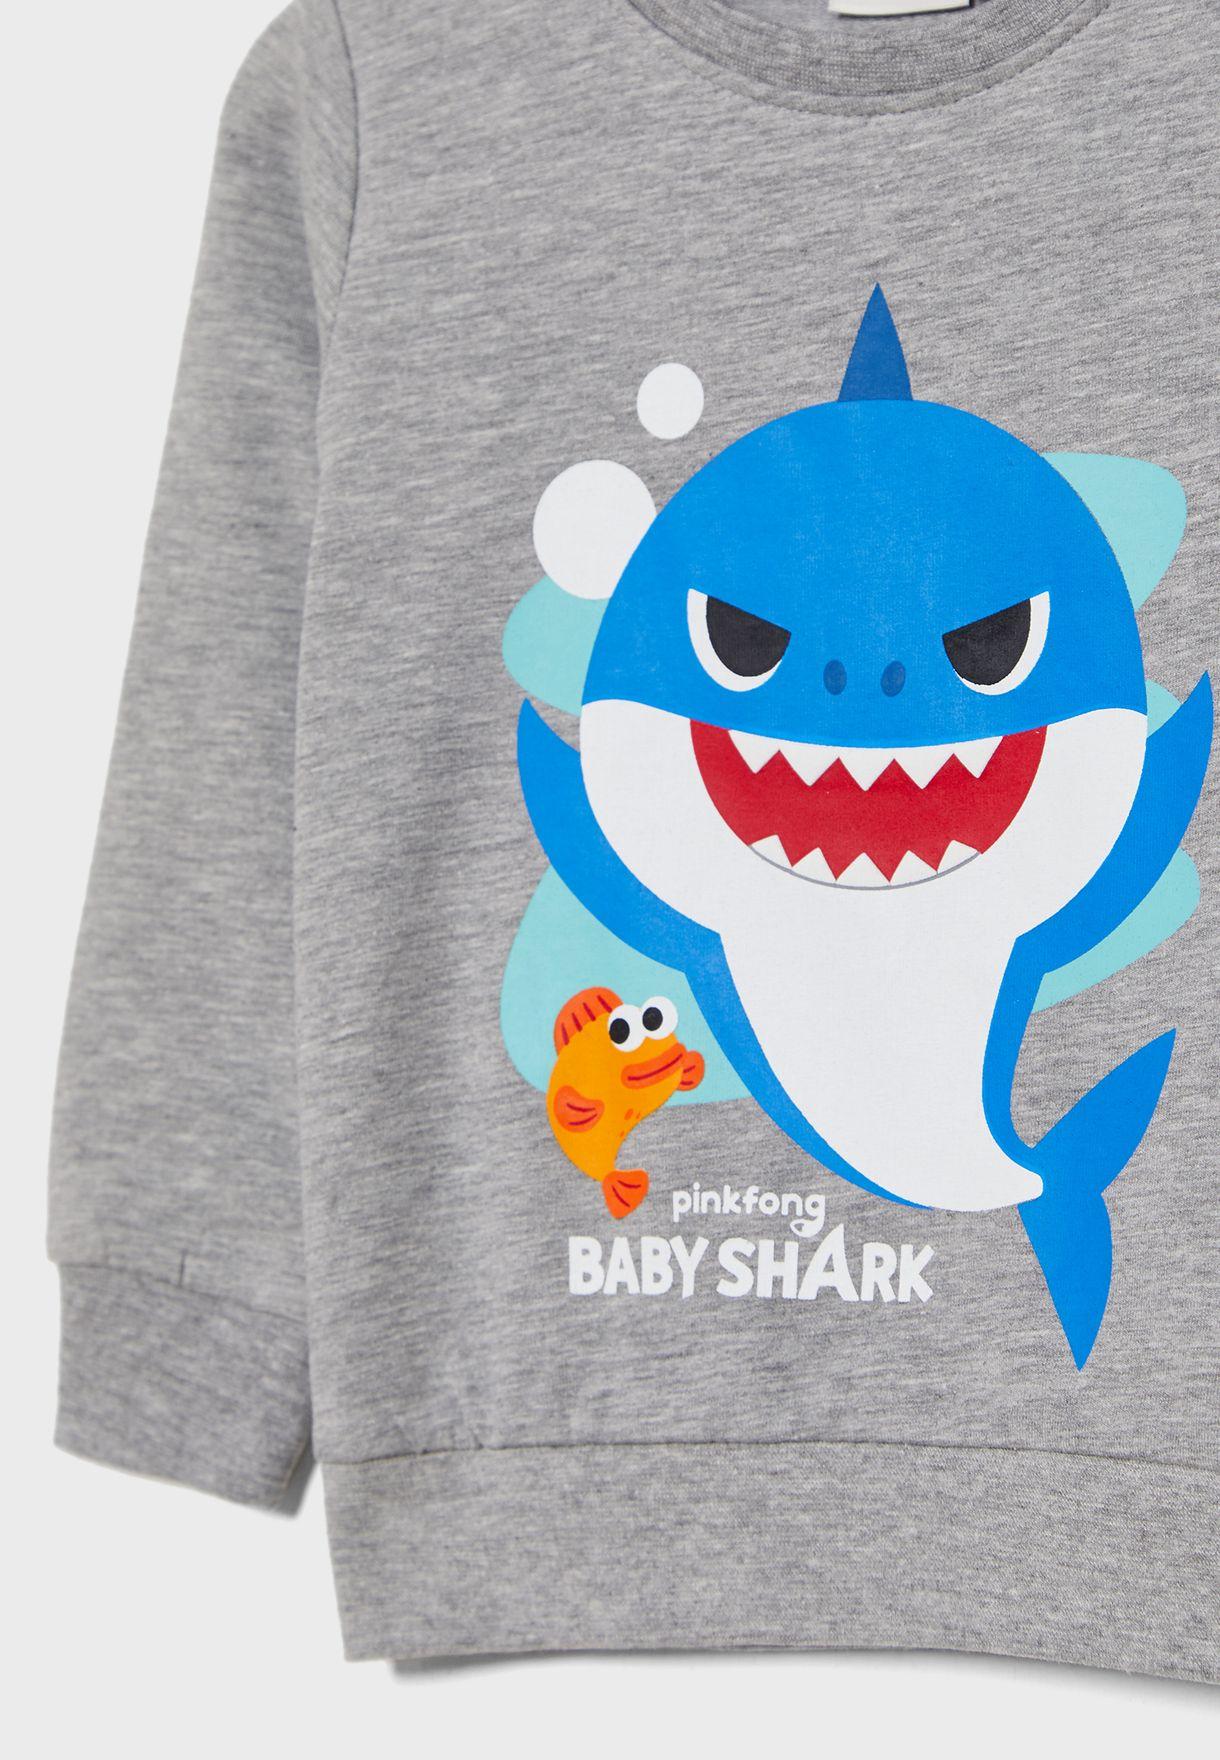 Buy Name It Grey Kids Baby Shark Sweatshirt For Kids In Mena Worldwide 13180623